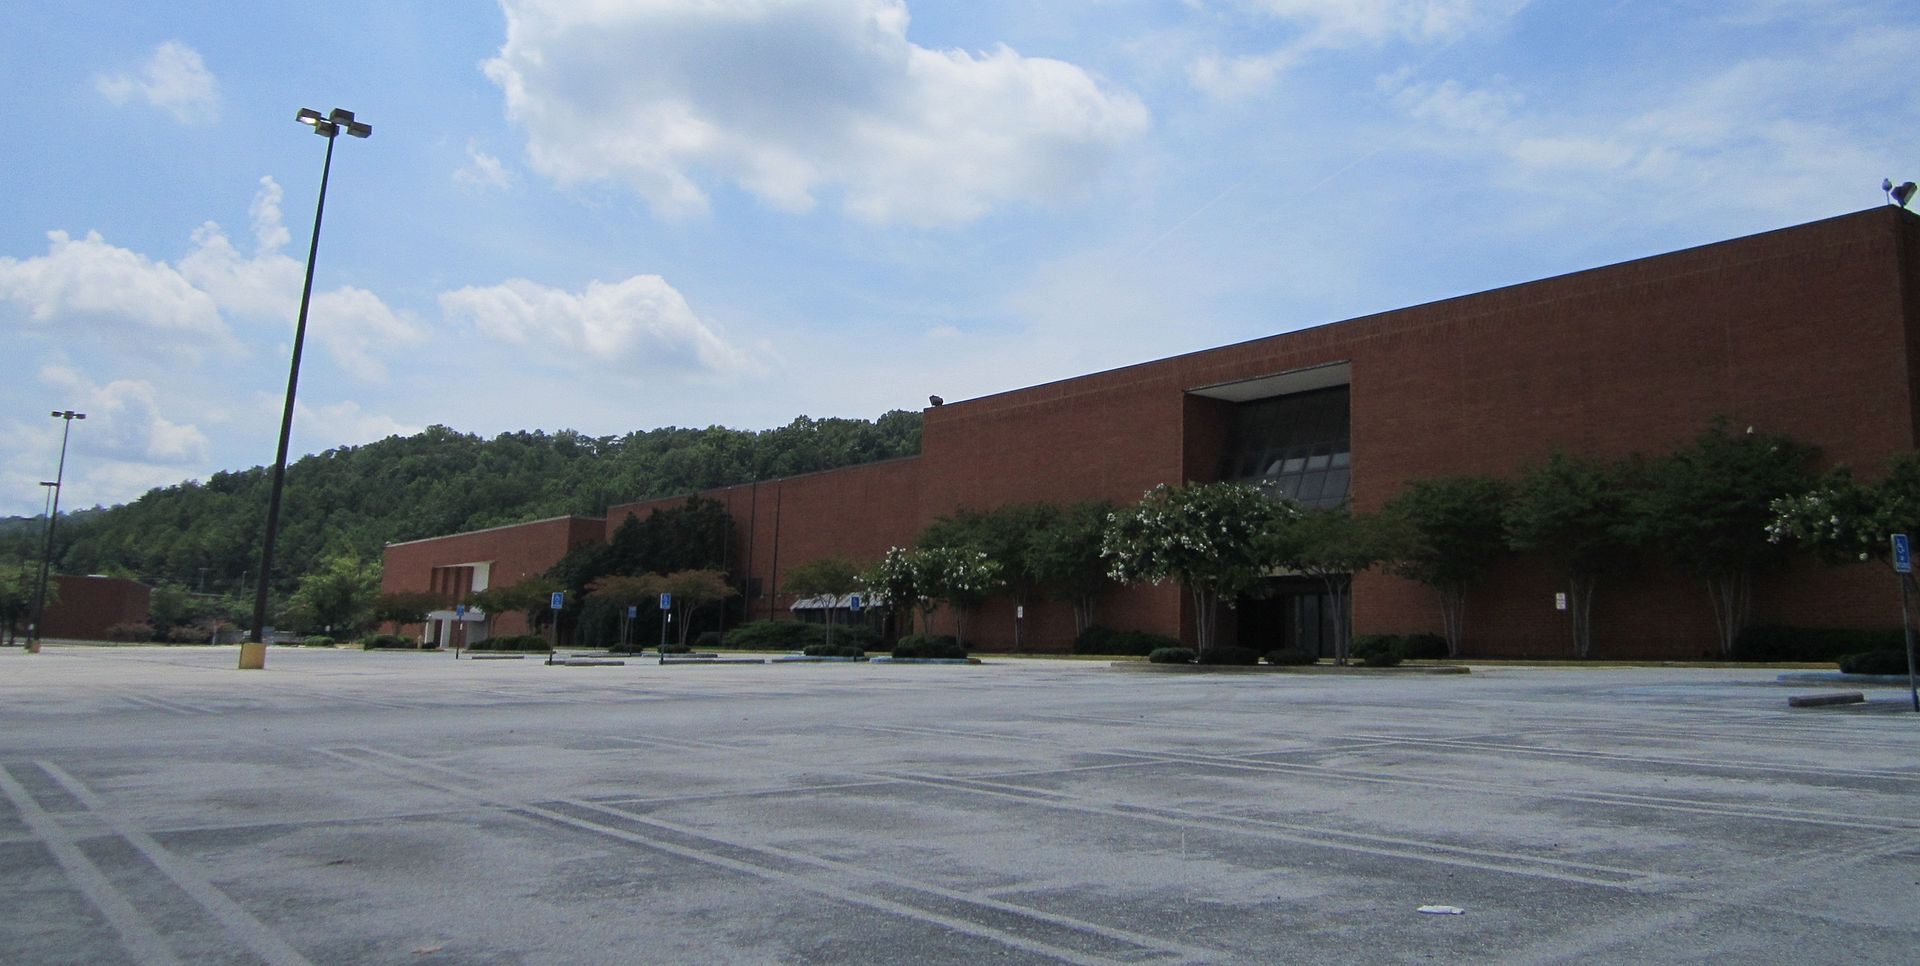 Church buying Century Plaza for new church, school